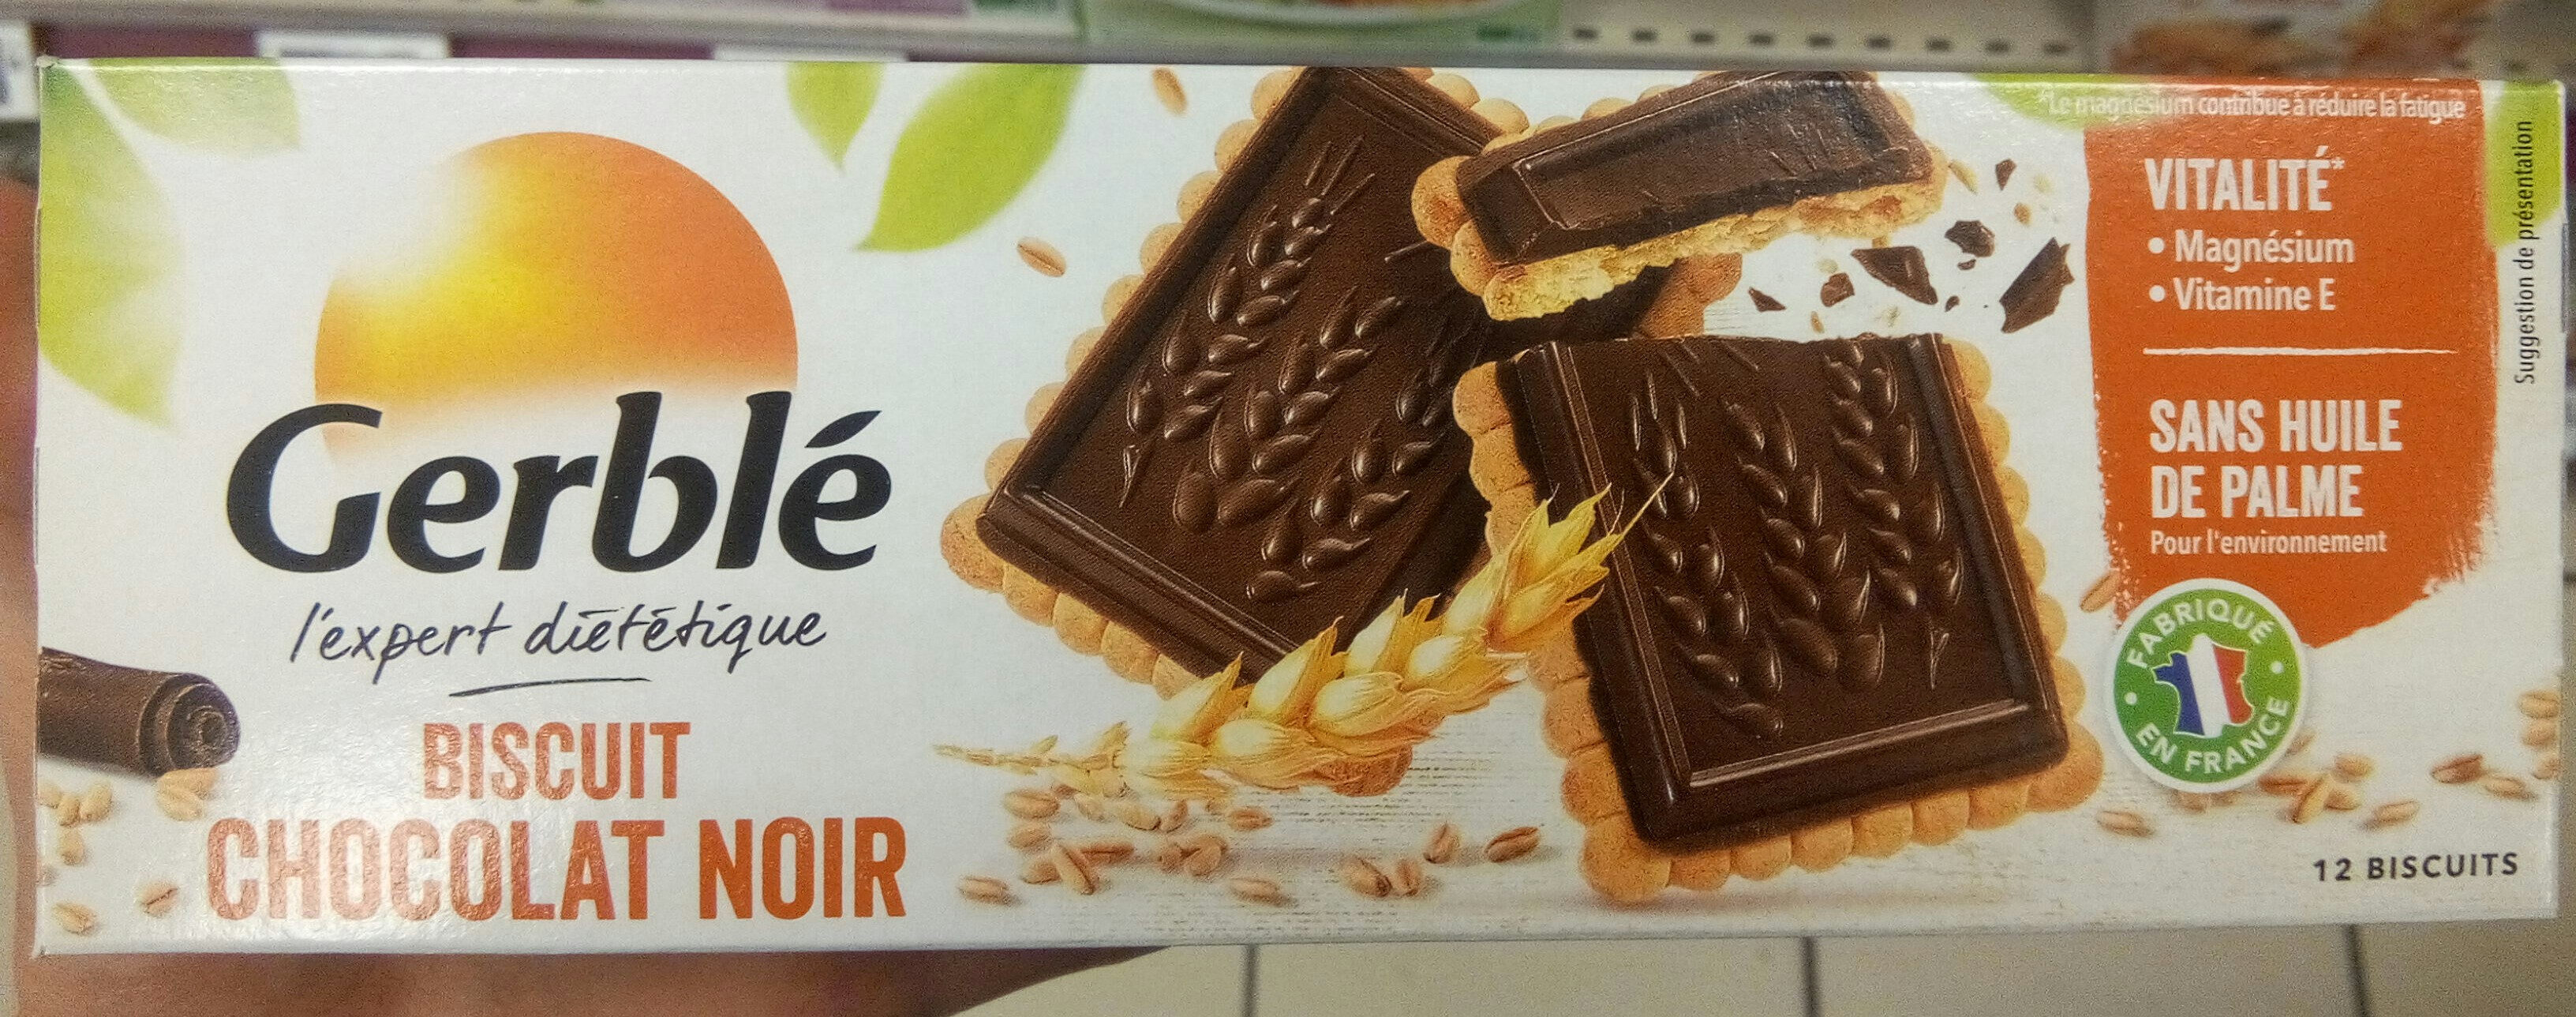 Biscuit Chocolat noir intense - Product - fr